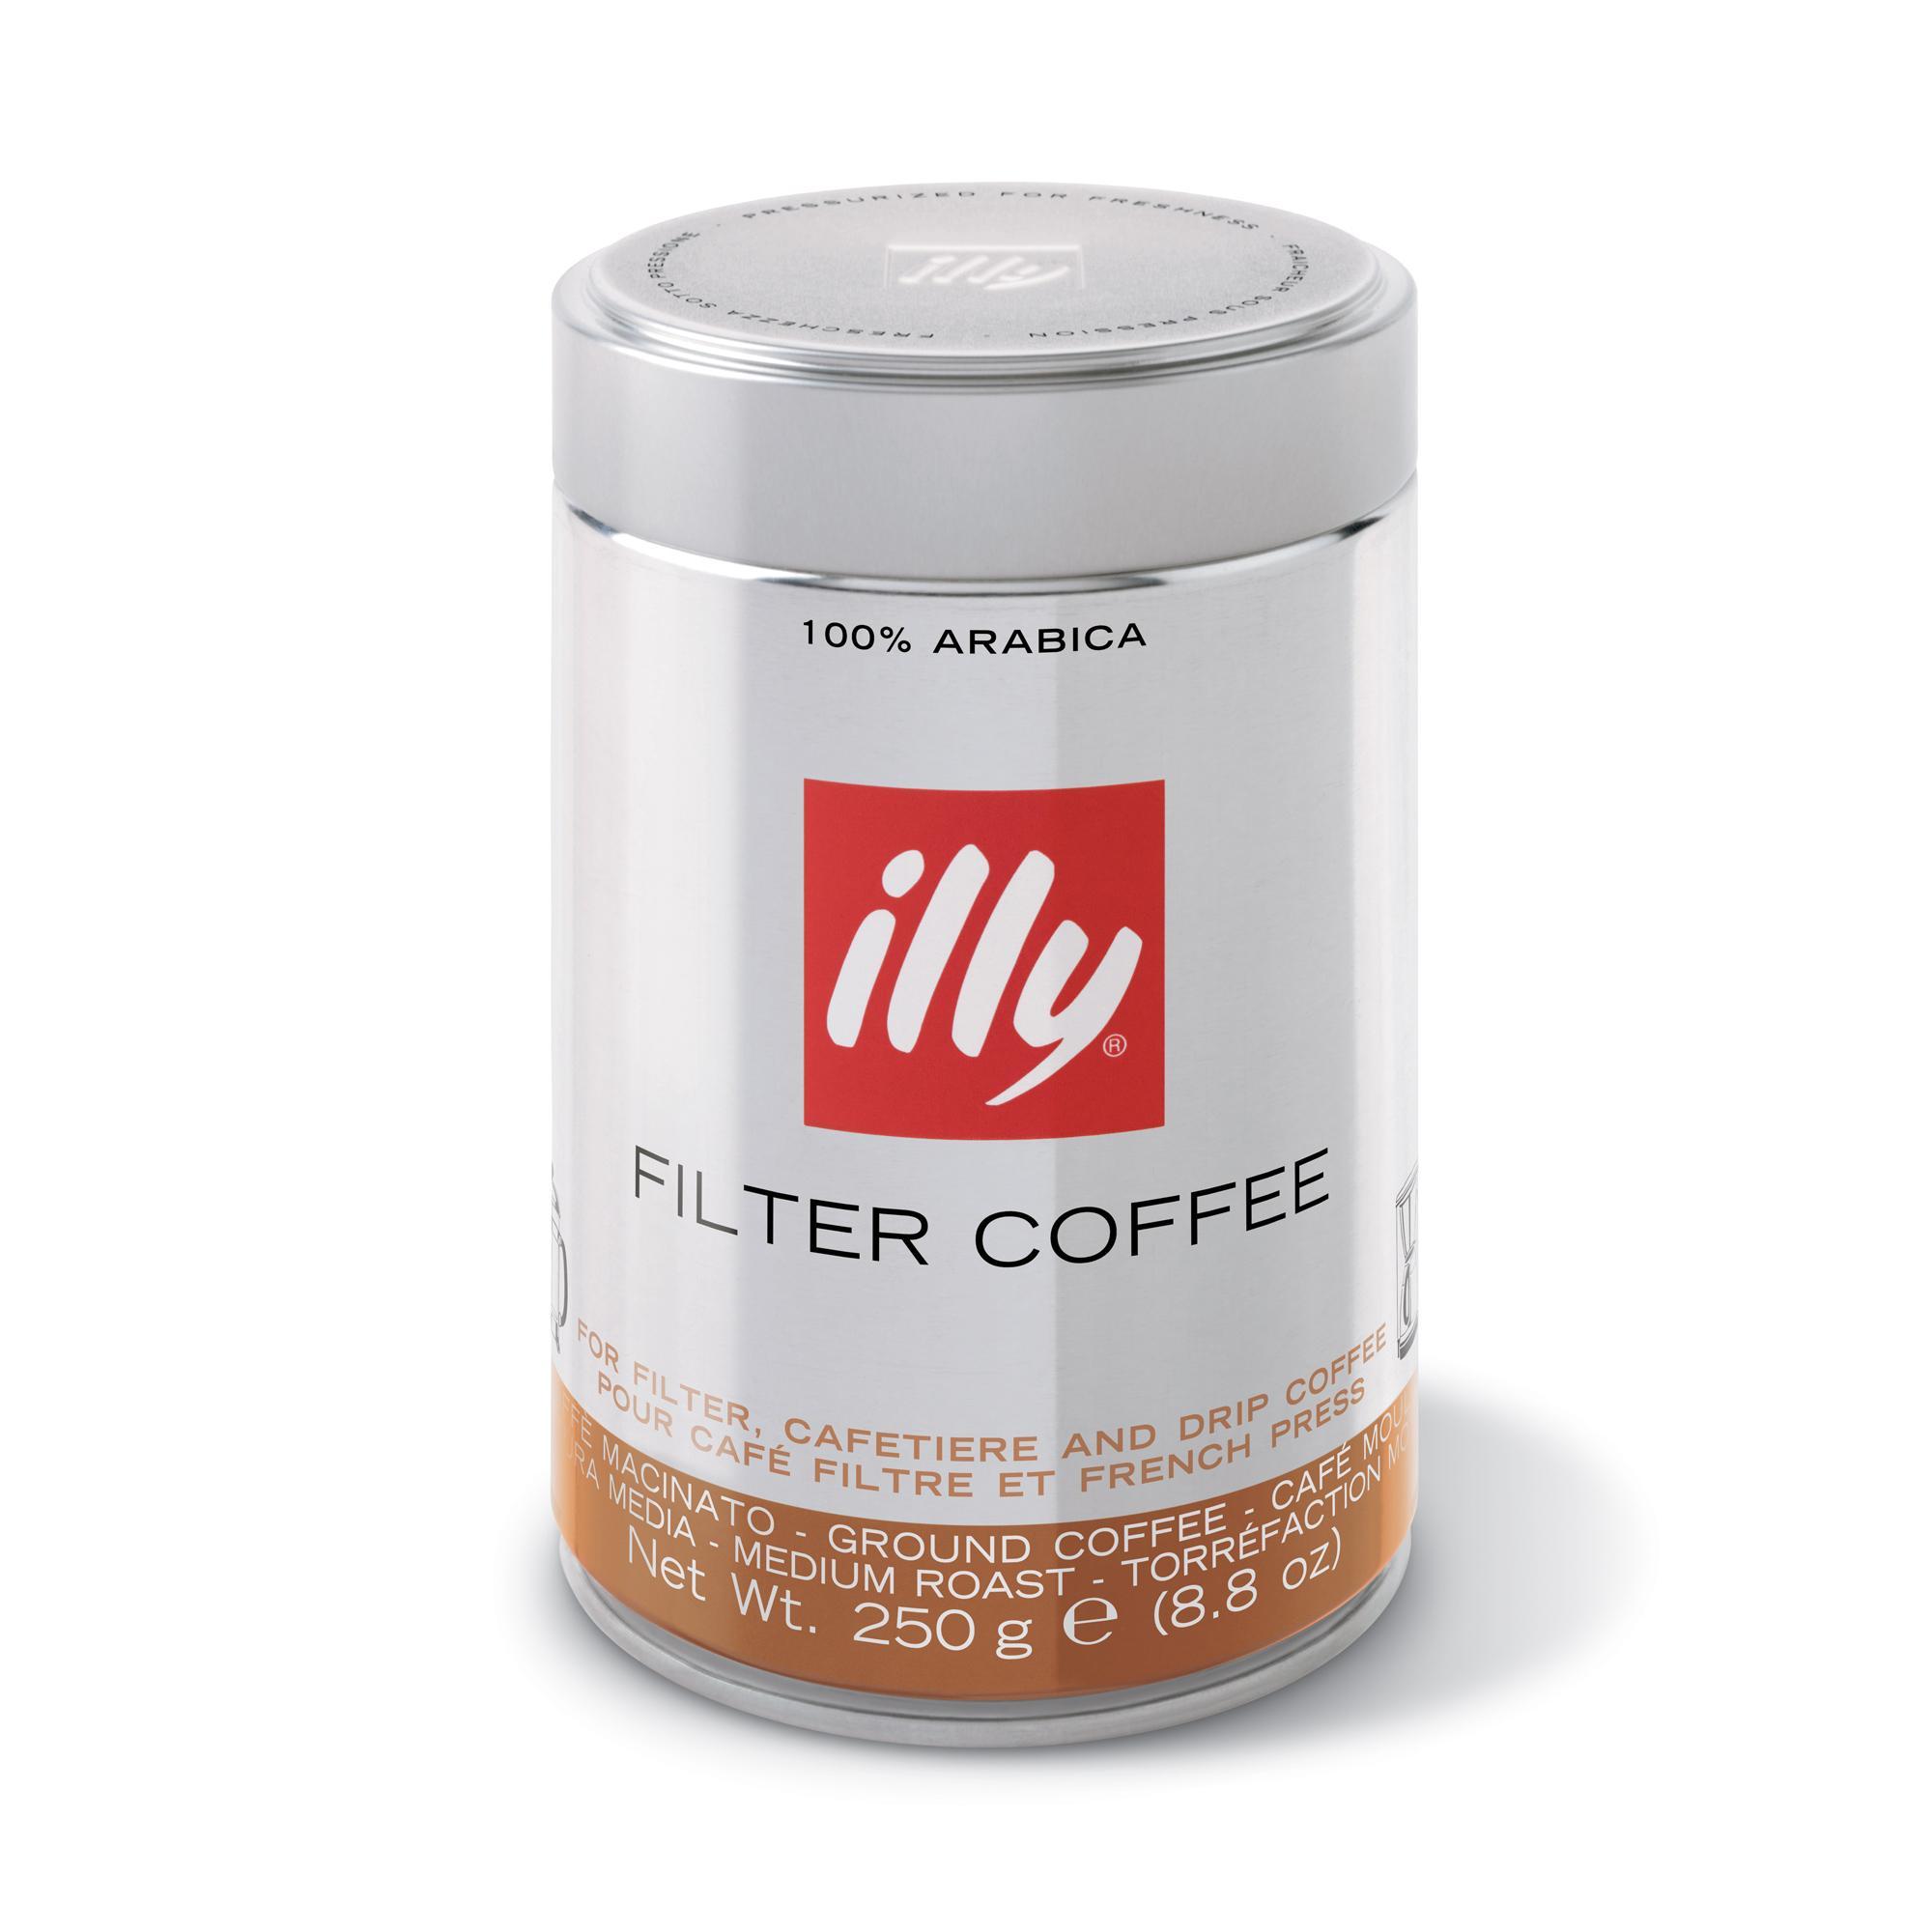 b02628fb0ab841 illy Caffè Filtro all'Americana Macinato Tostatura Media - 6 Pezzi ...